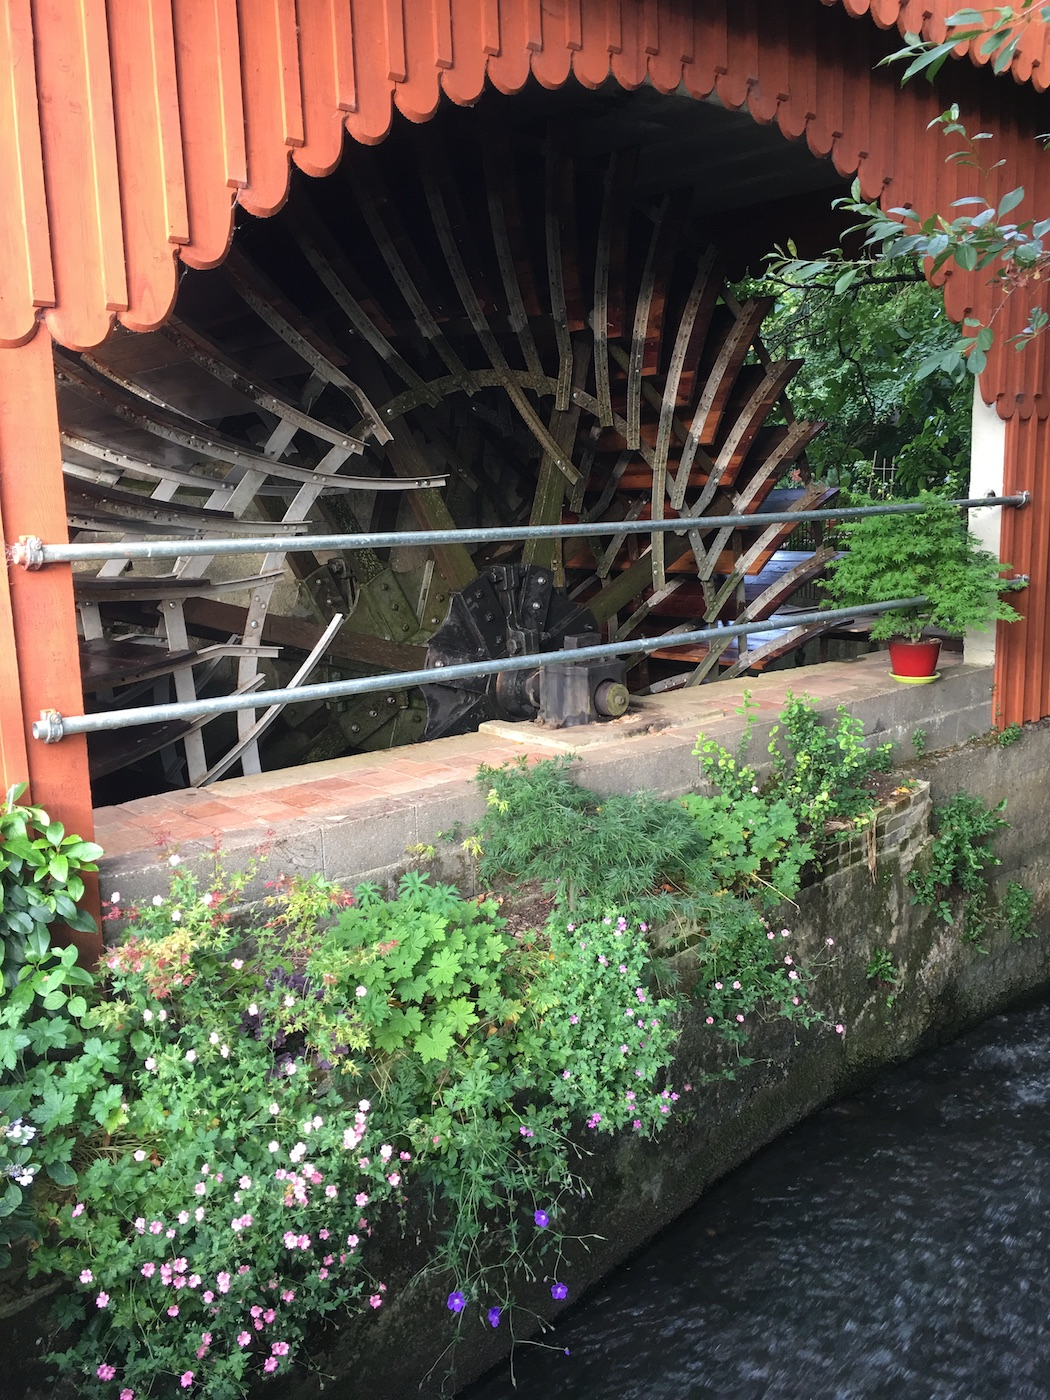 Moulin de la Vasrole